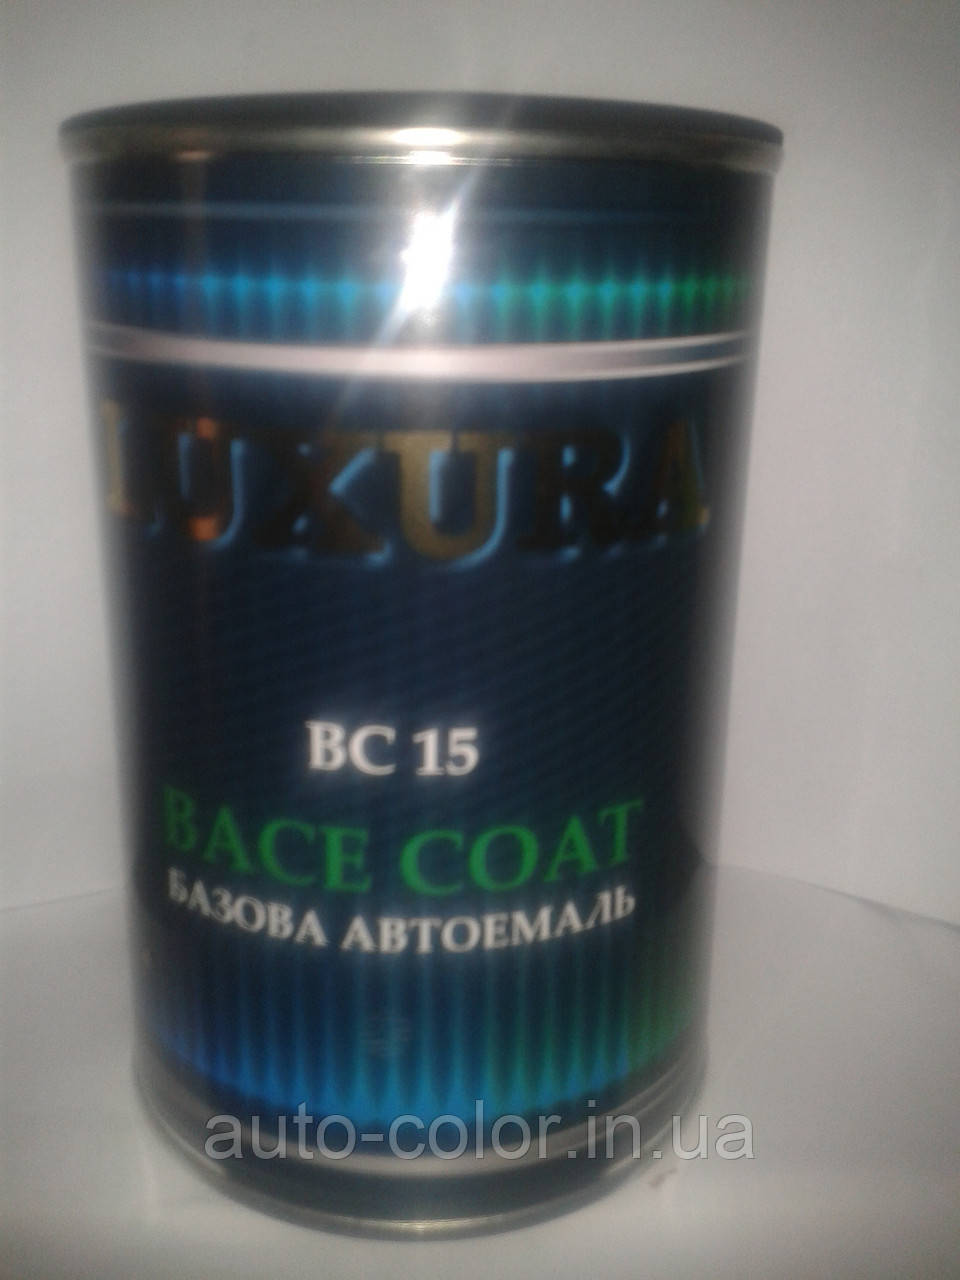 33U DAEWOO  Базовая автоэмаль Luxura 1 л